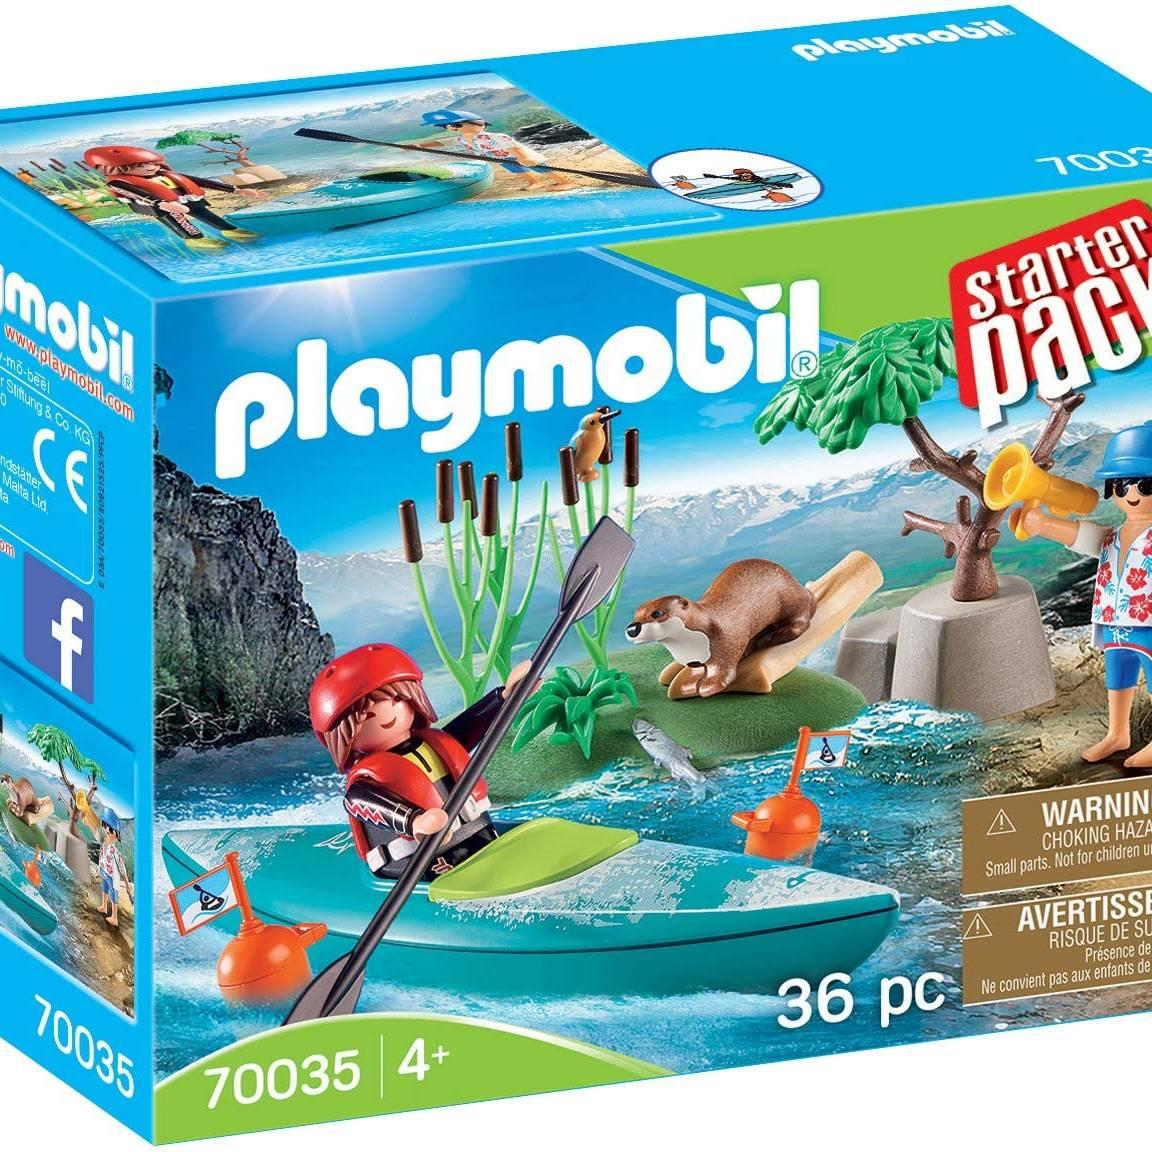 Playmobil 70035 Starter Pack Kayak Adventure